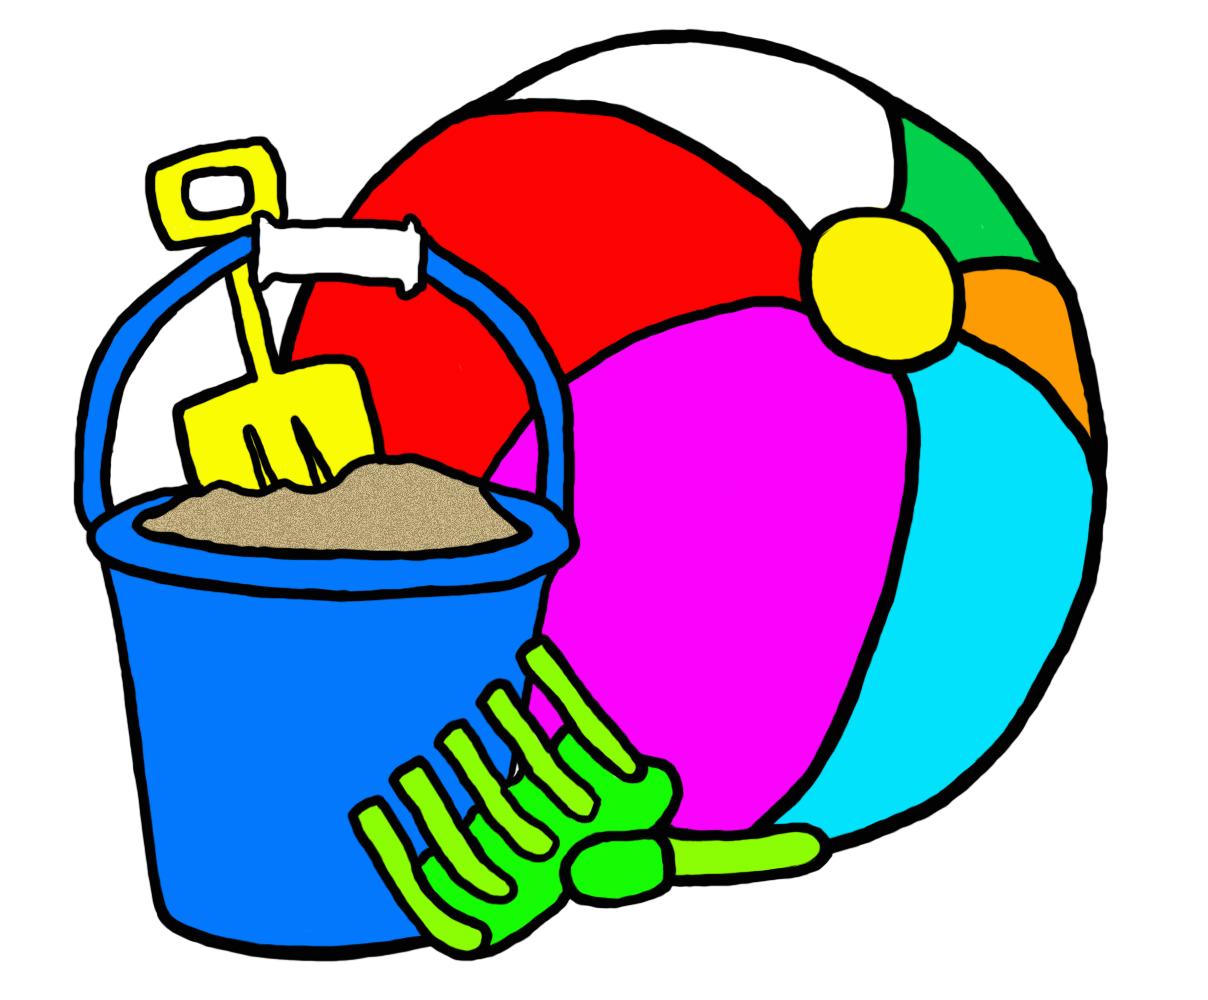 Graphic, Clip Art, Beach Toys, Summer, F-Graphic, clip art, beach toys, summer, fun, pail, bucket,-5